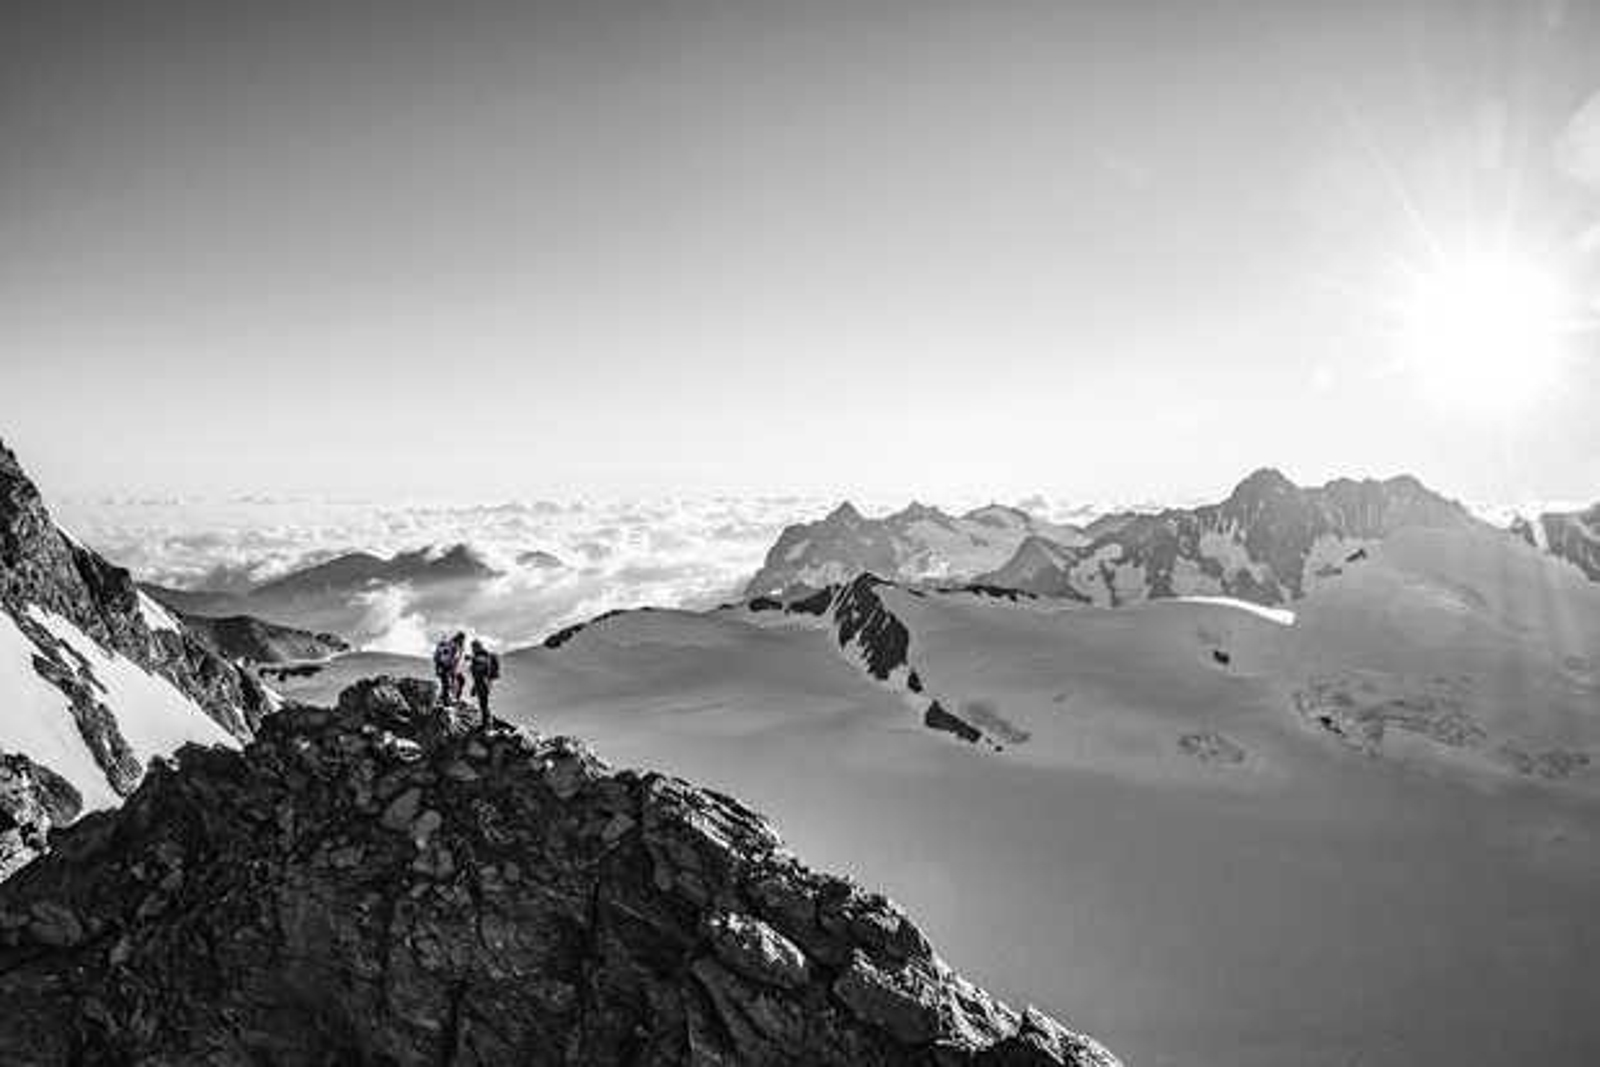 Trugberg III, Berner Oberland, Aletschgebiet, Schweiz / Thomas Senf - Mammut Collection